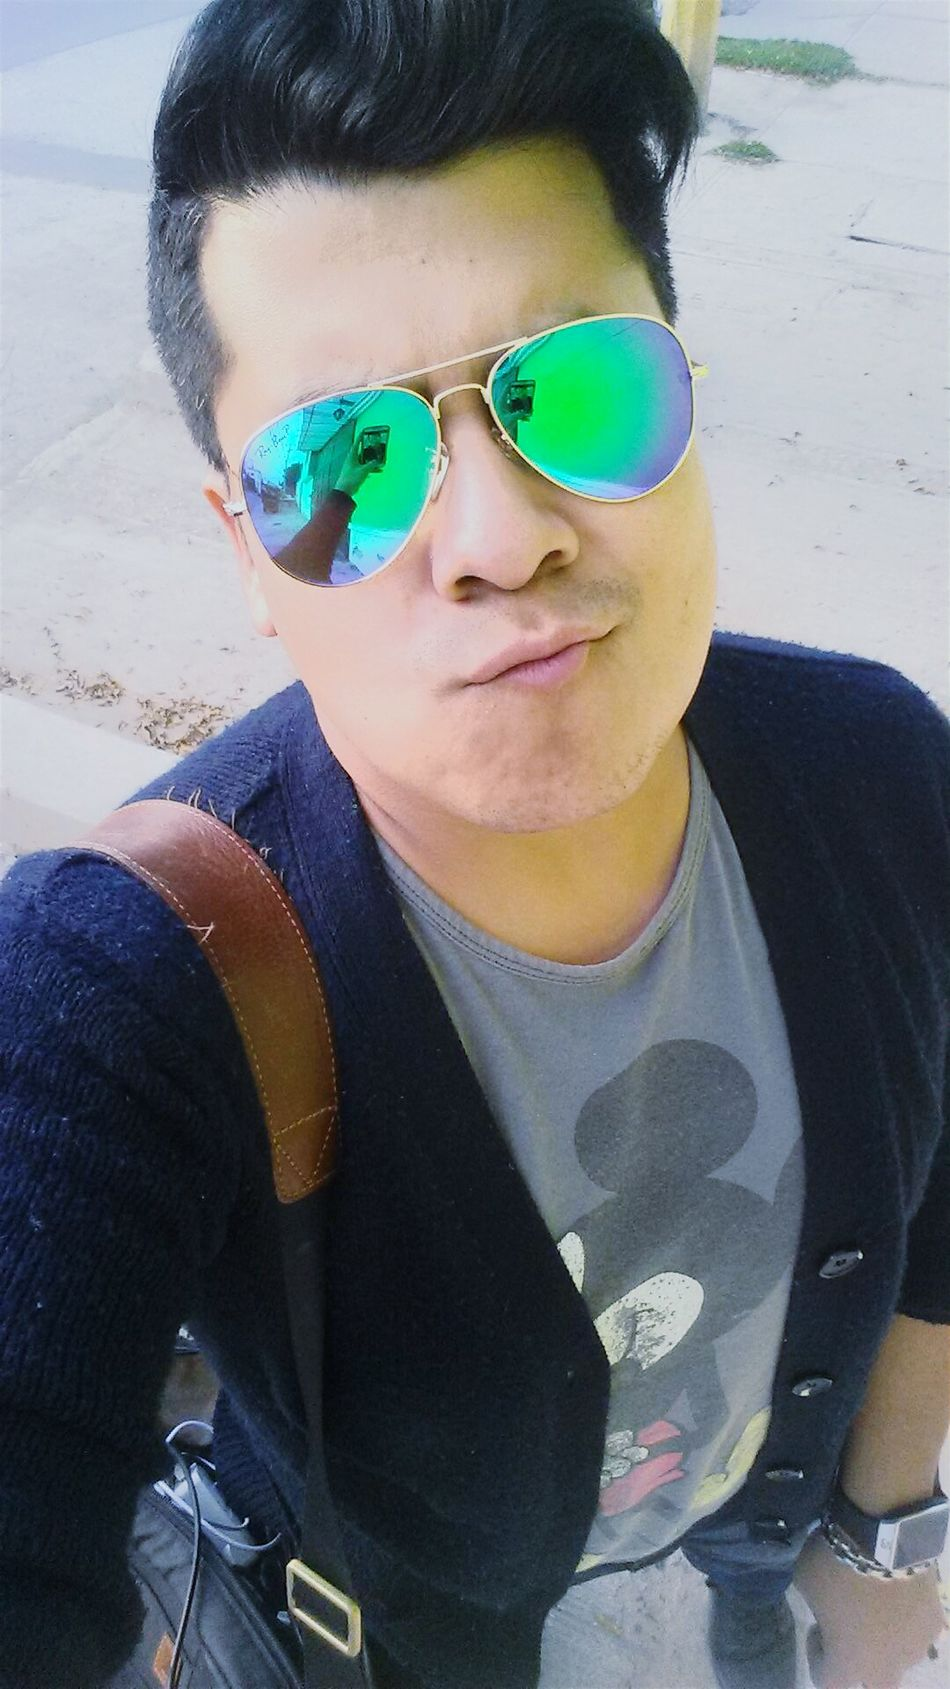 Kianfotografia Mexicanboy Kiss Selfie ✌ Followme